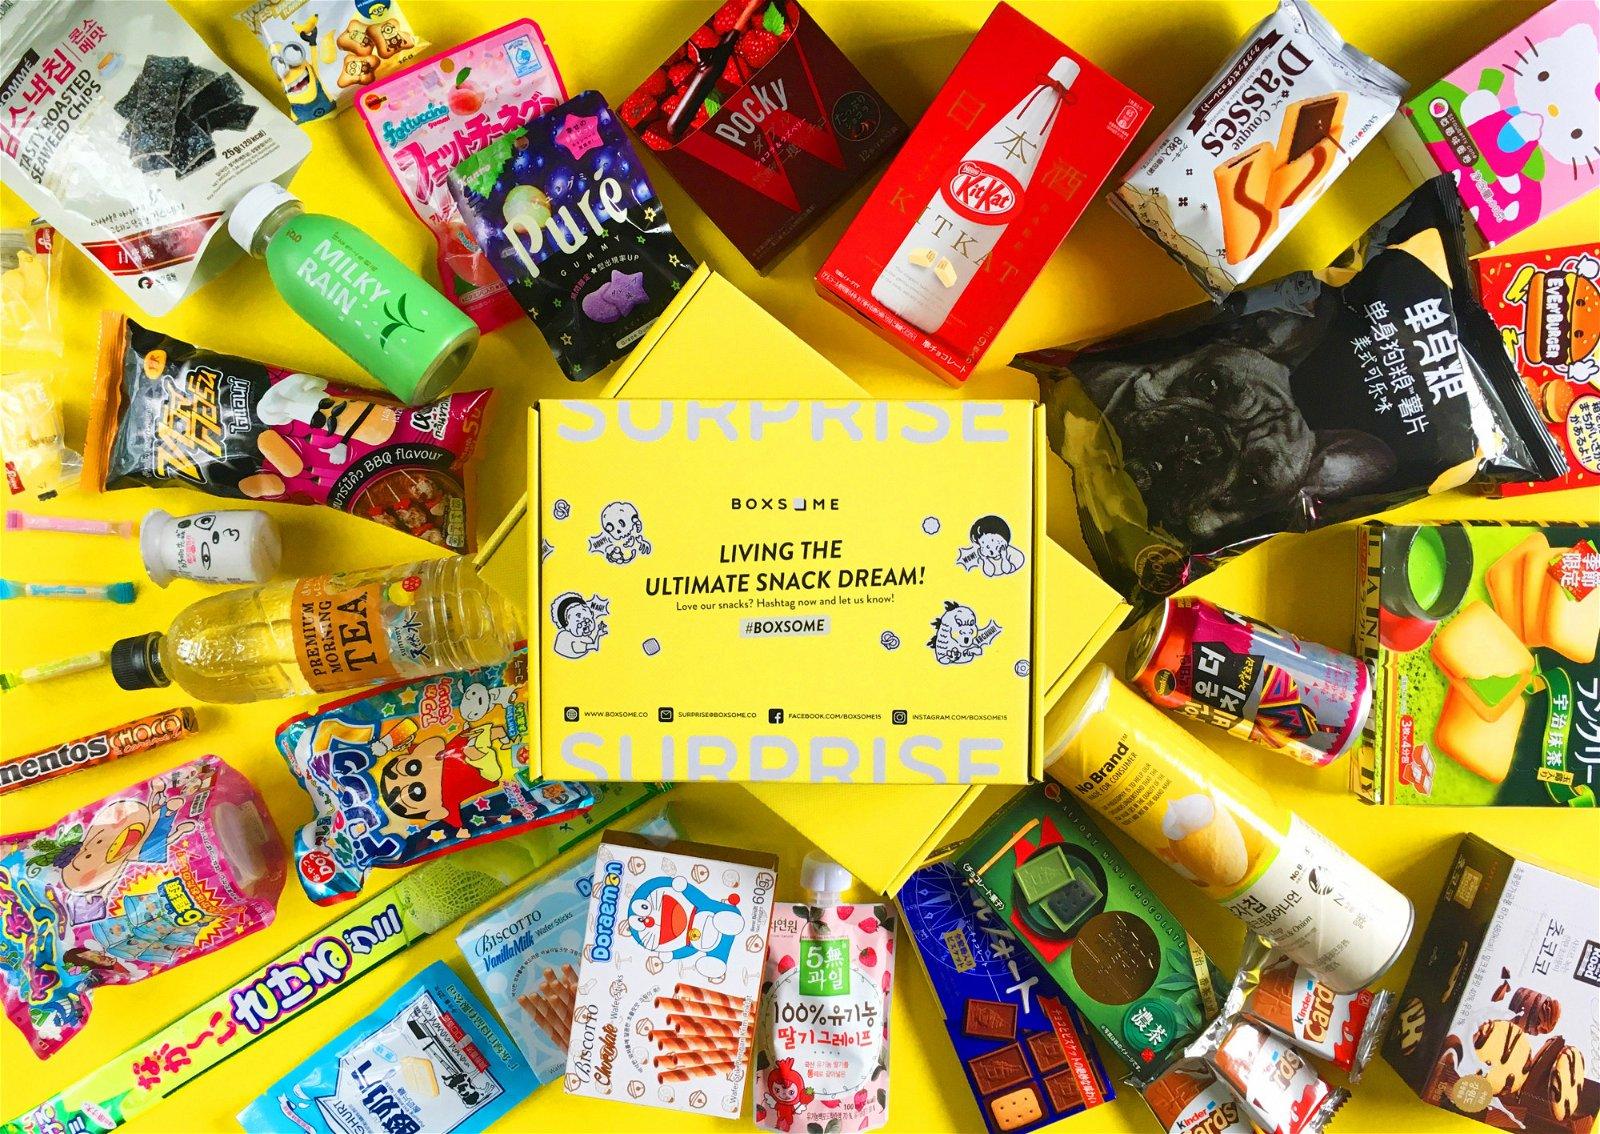 "Boxsome是3人第一份创业,戚铭恩坦言,刚开始时,所有事情一窍不懂,甚至连应该选择怎样的盒子也毫无头绪。""很多人觉得把零食堆满进箱子就好了。""但其实不然,因为零食包装大小不一的关系,他们每个月都需要花很多心思在摆放设计上。"